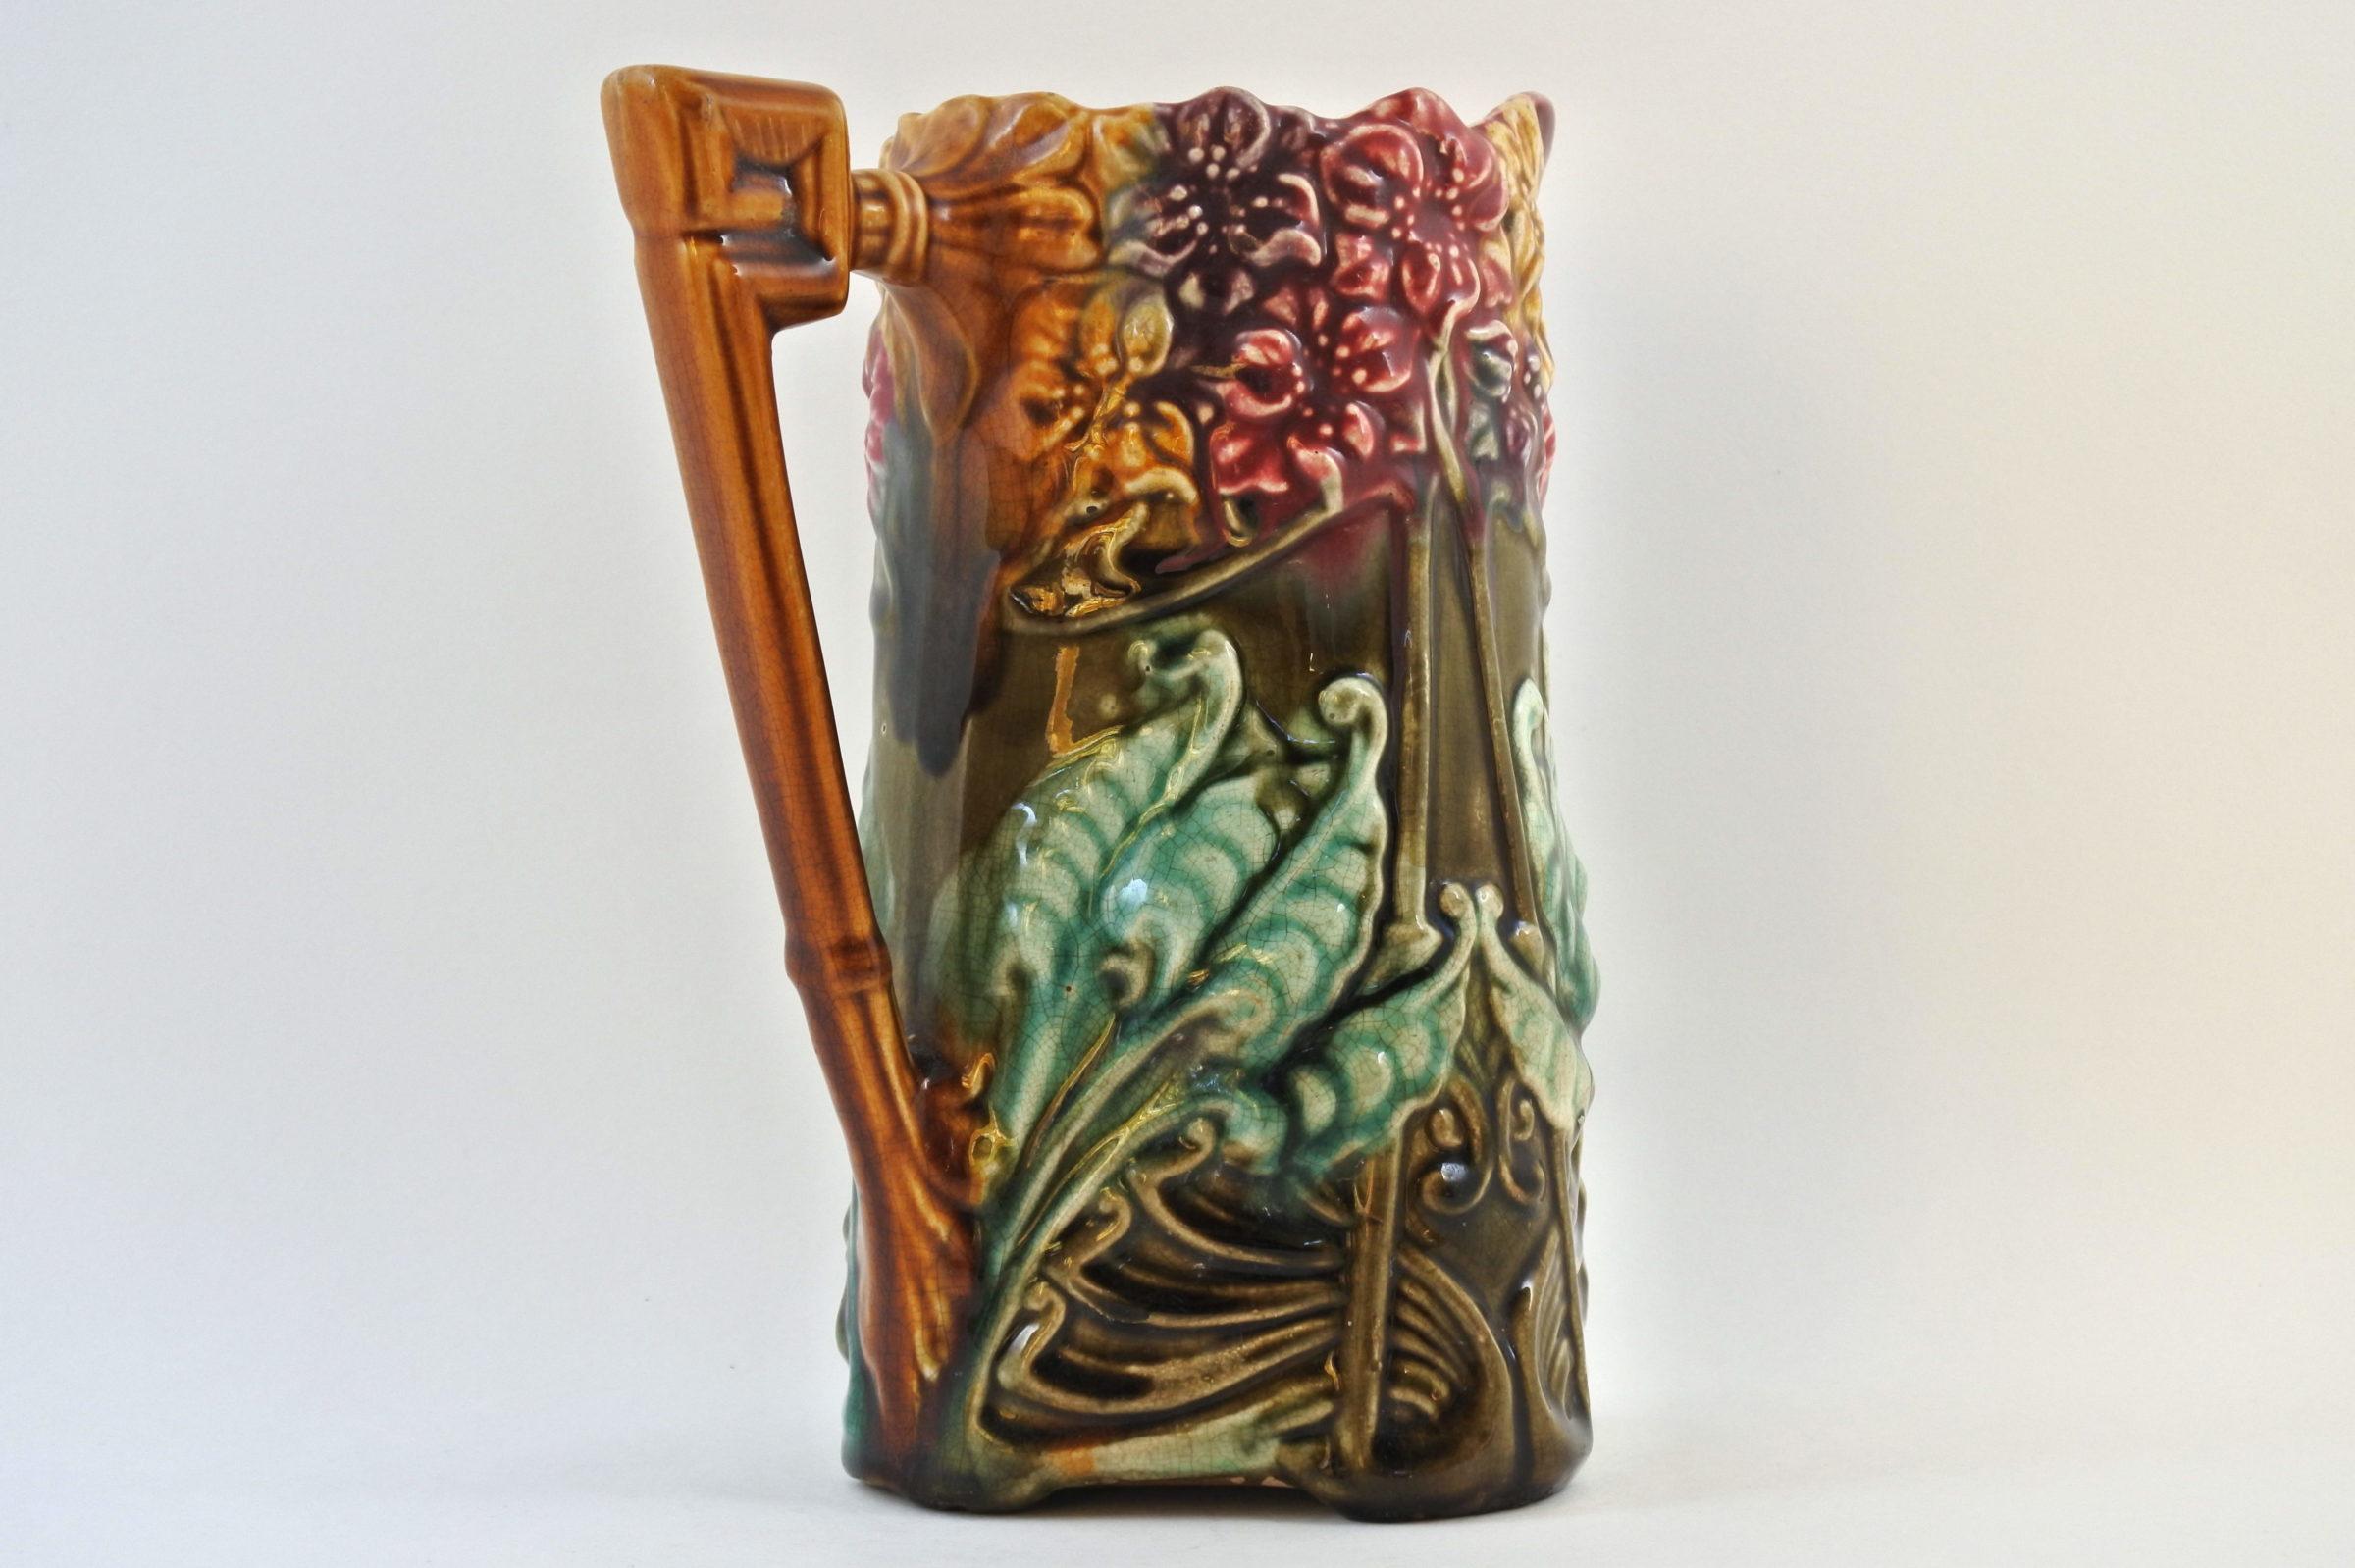 Brocca in ceramica barbotine con giacinti - Jacinthes - 3